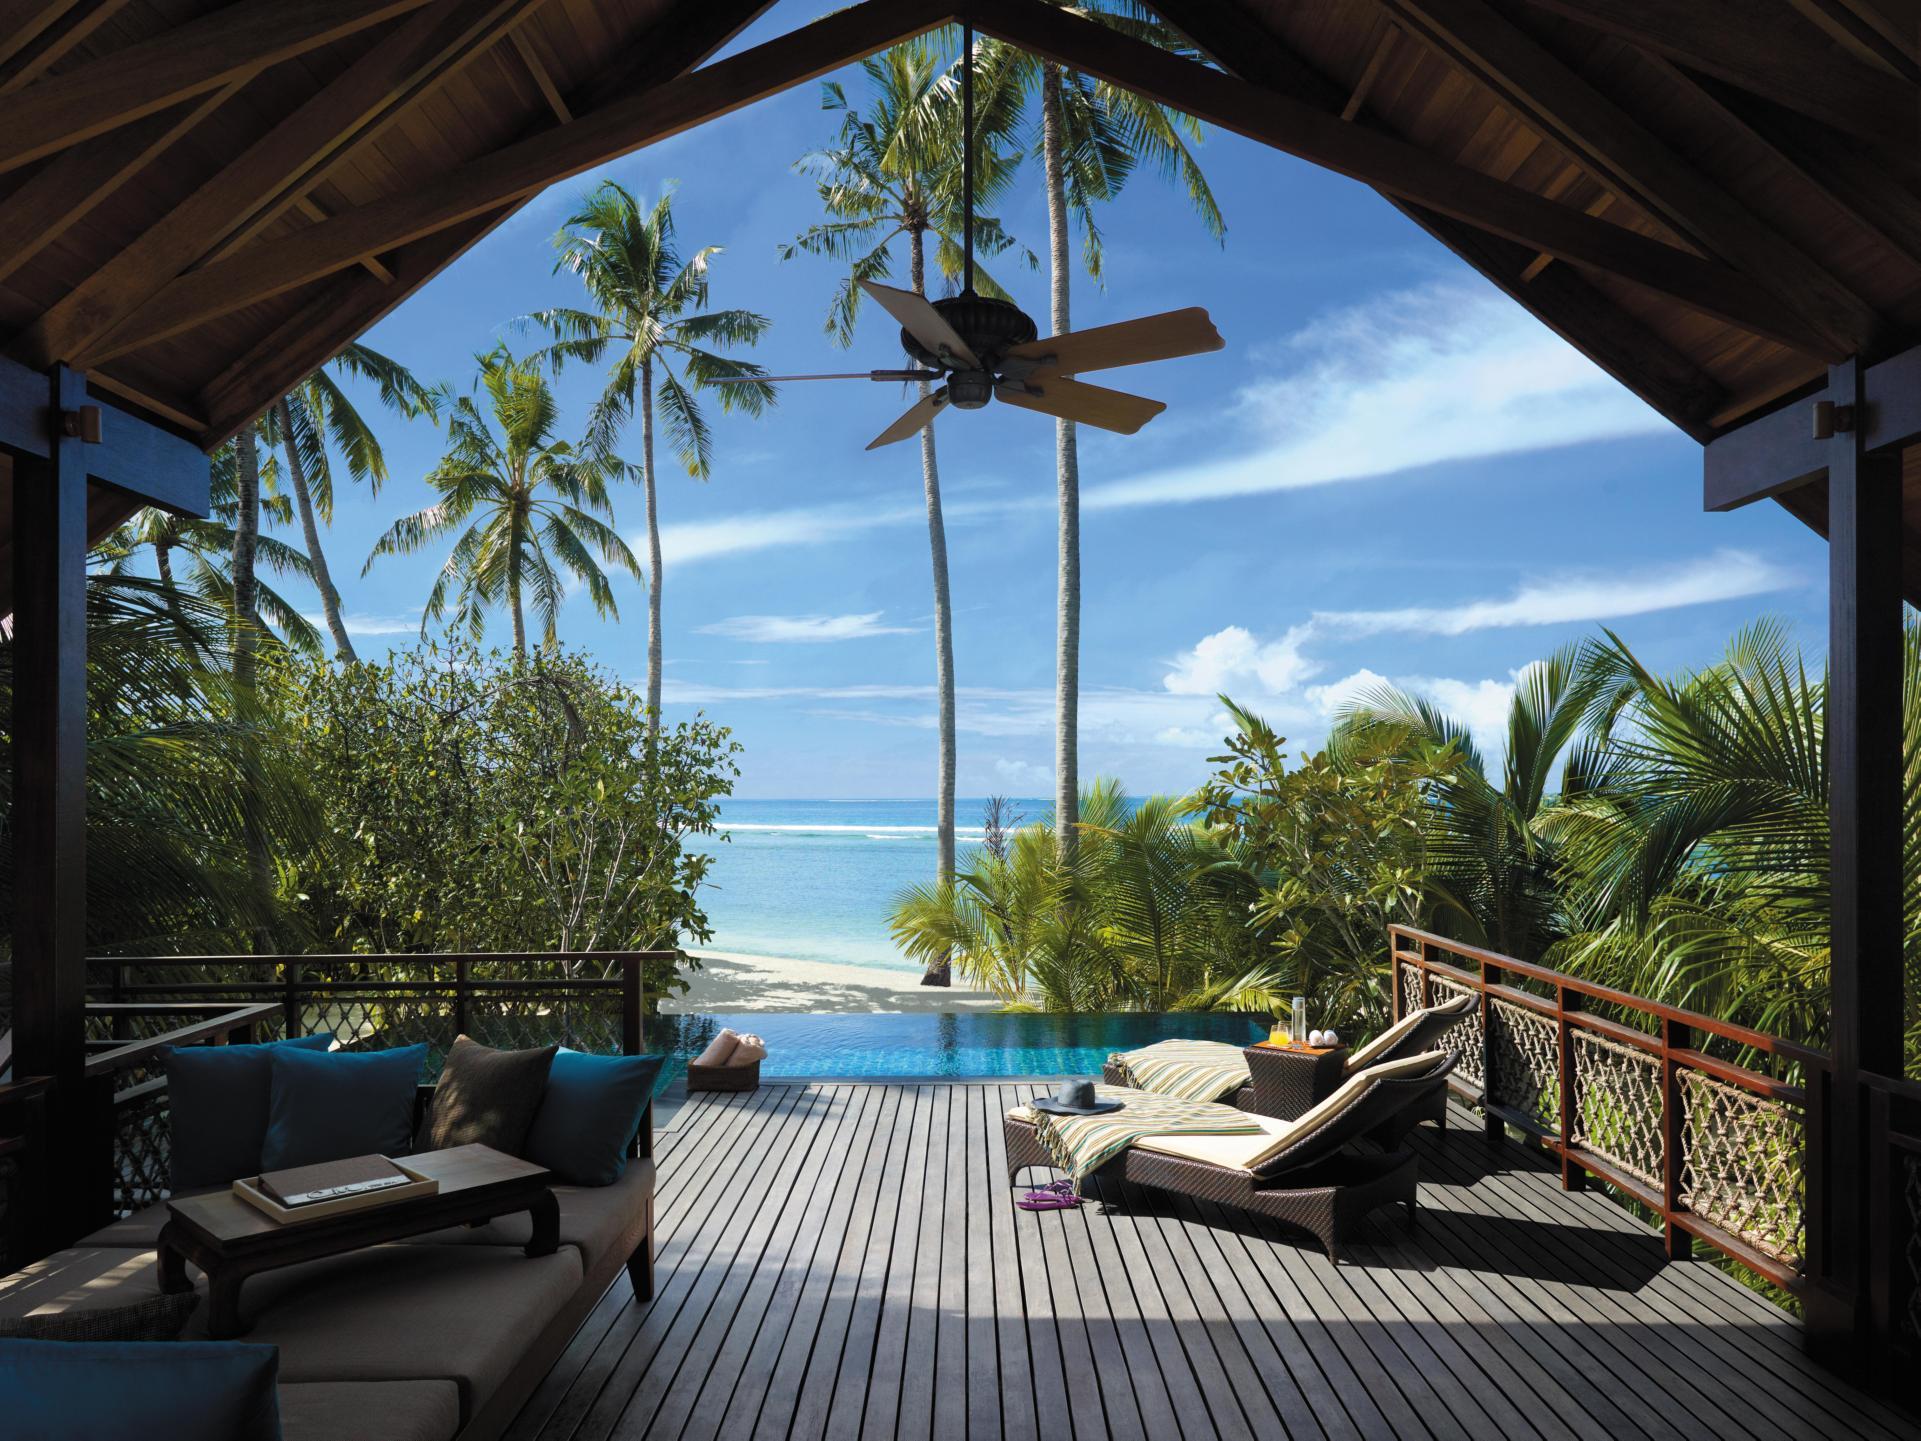 Creating a backyard oasis 26 sleek pool designs for Beach house yard ideas